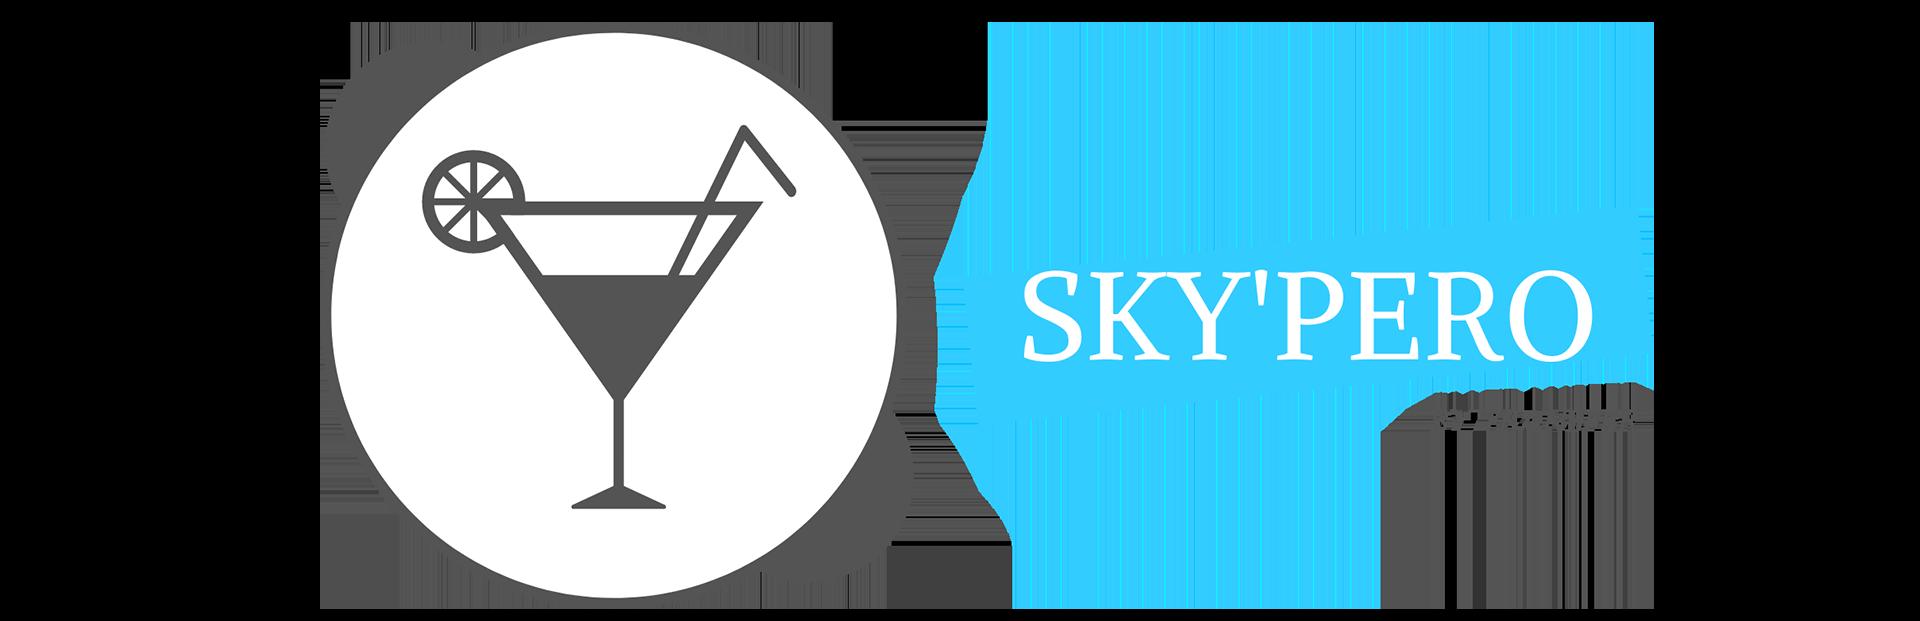 Sky'pero Transfer logo